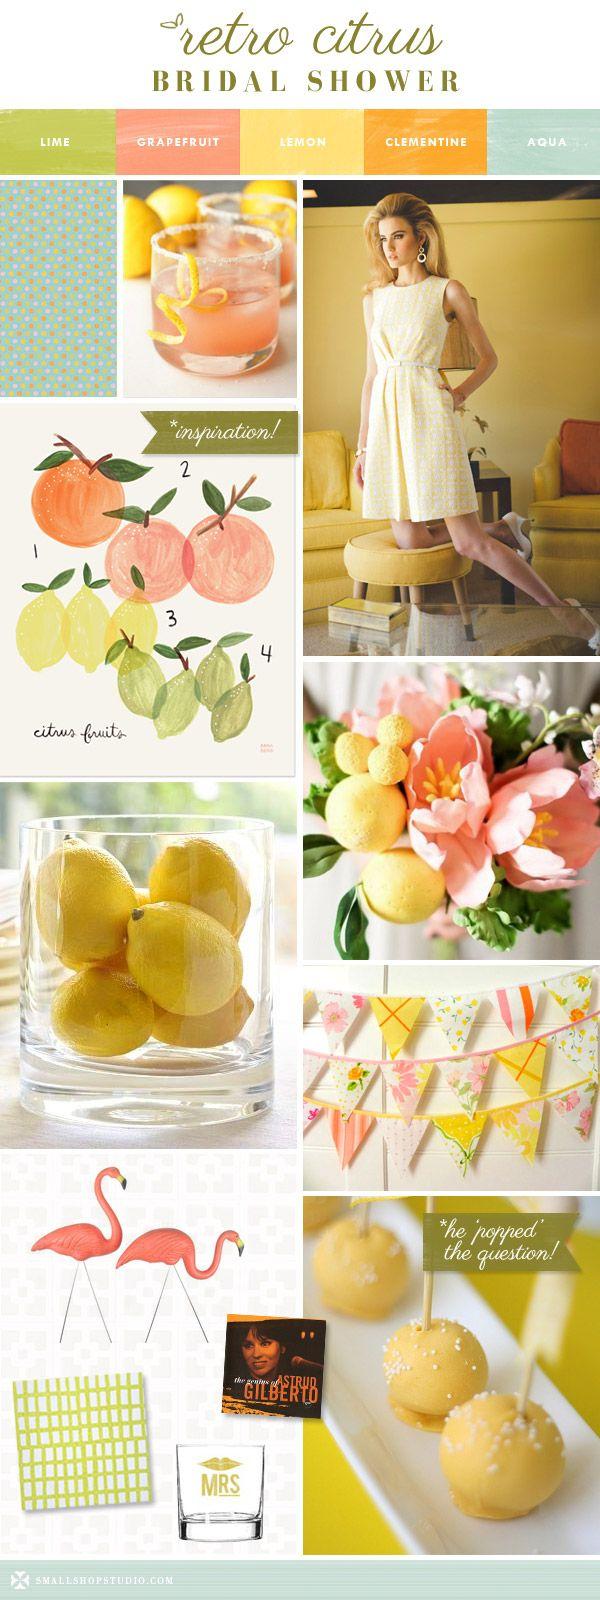 small shop: retro citrus bridal shower, lemon yellow, grapefruit, orange, lime, aqua, Trina Turk, flamingos, Astrud Gilberto, bossa nova, bunting, cocktails, cake pops